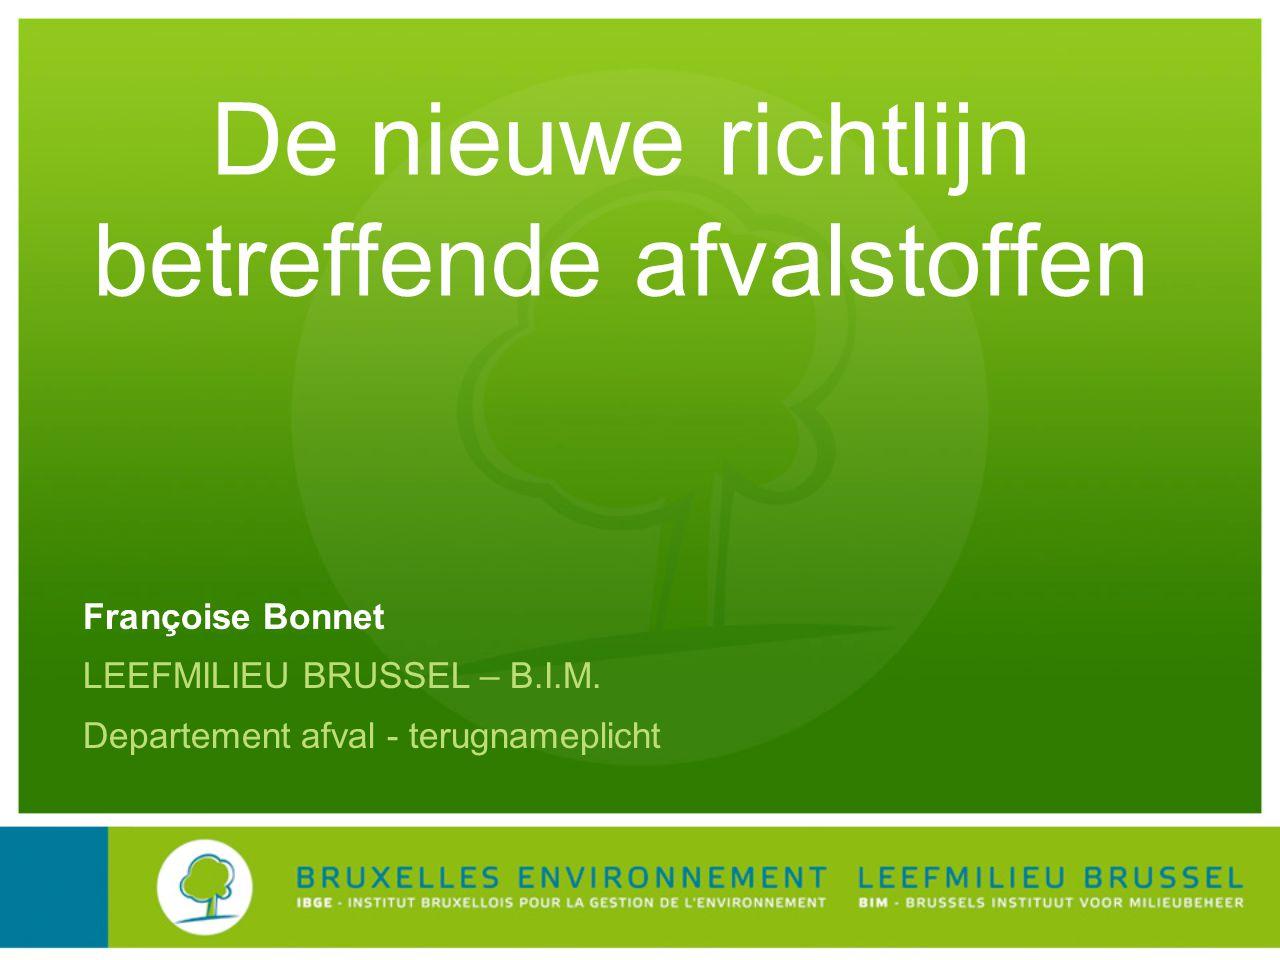 De nieuwe richtlijn betreffende afvalstoffen Françoise Bonnet LEEFMILIEU BRUSSEL – B.I.M.